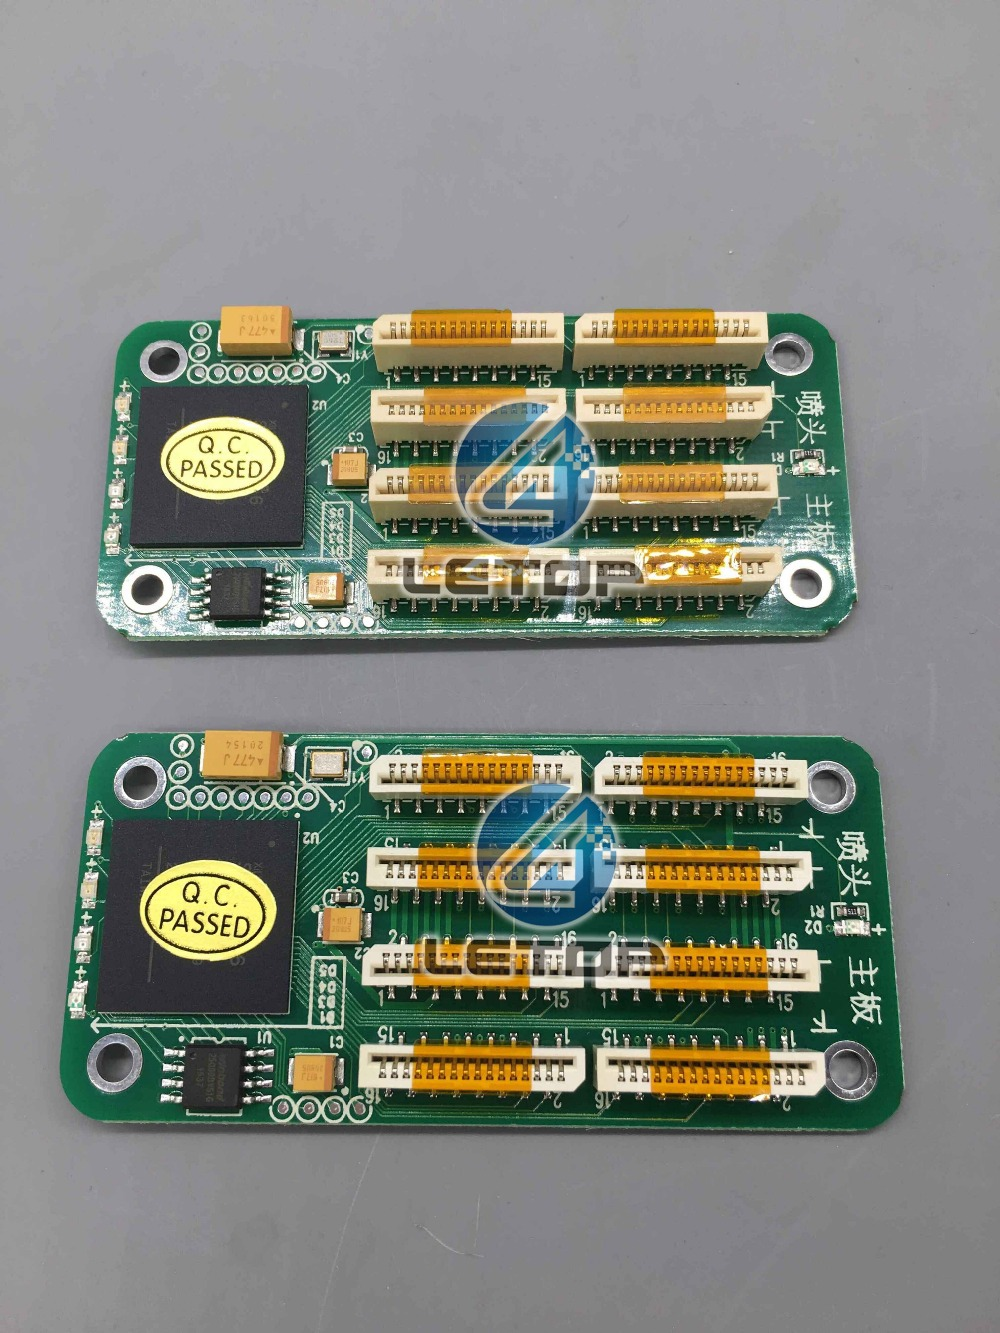 Hot sales!!5113 printhead decoder board for 5113 locked head